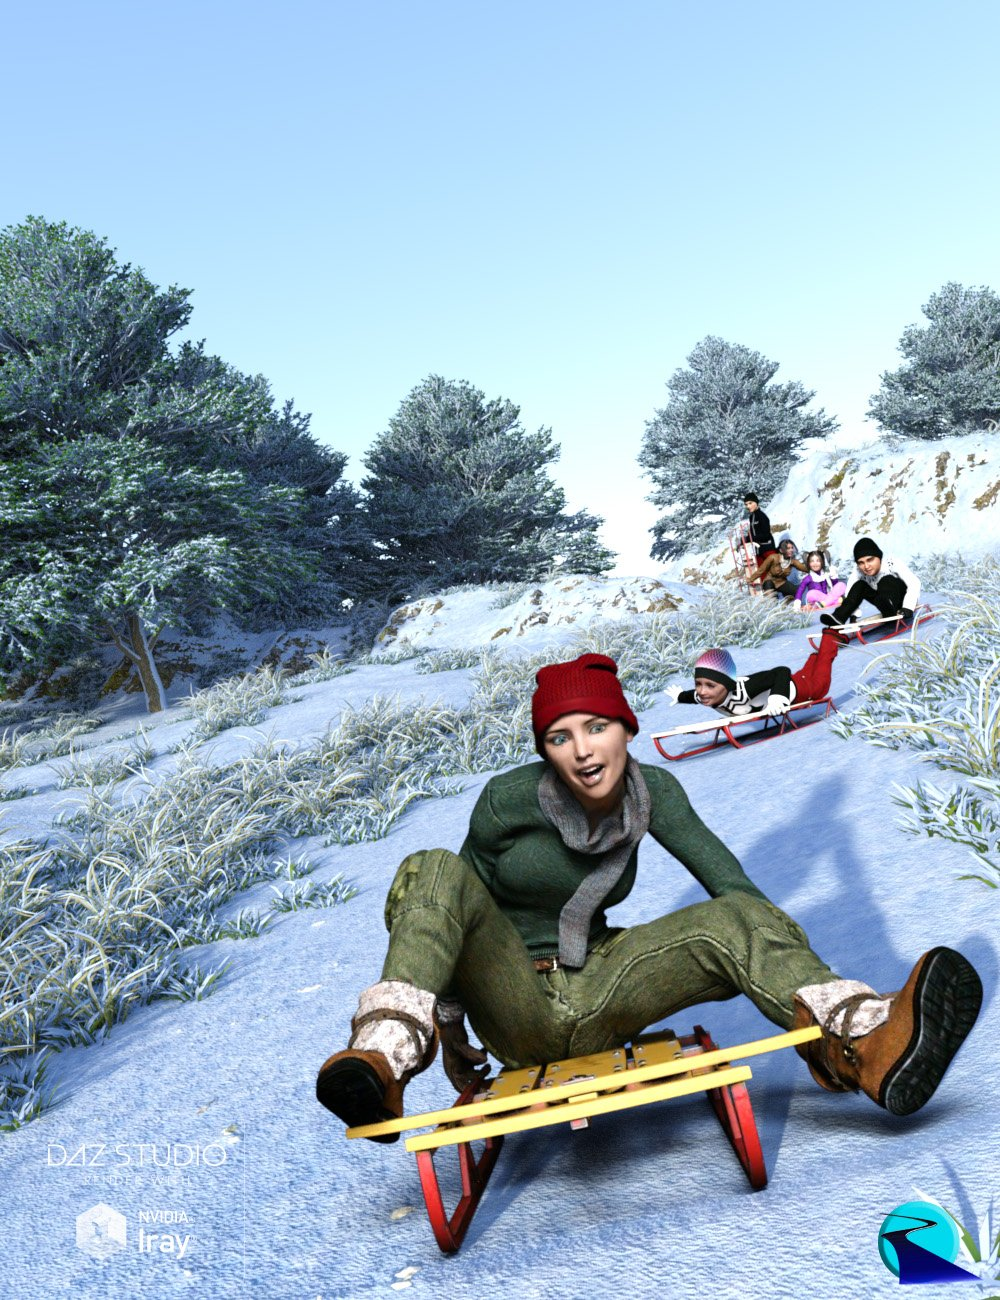 Now-Crowd Billboards - Sledding and Snowmen (Winter Fun Vol III) by: RiverSoft Art, 3D Models by Daz 3D